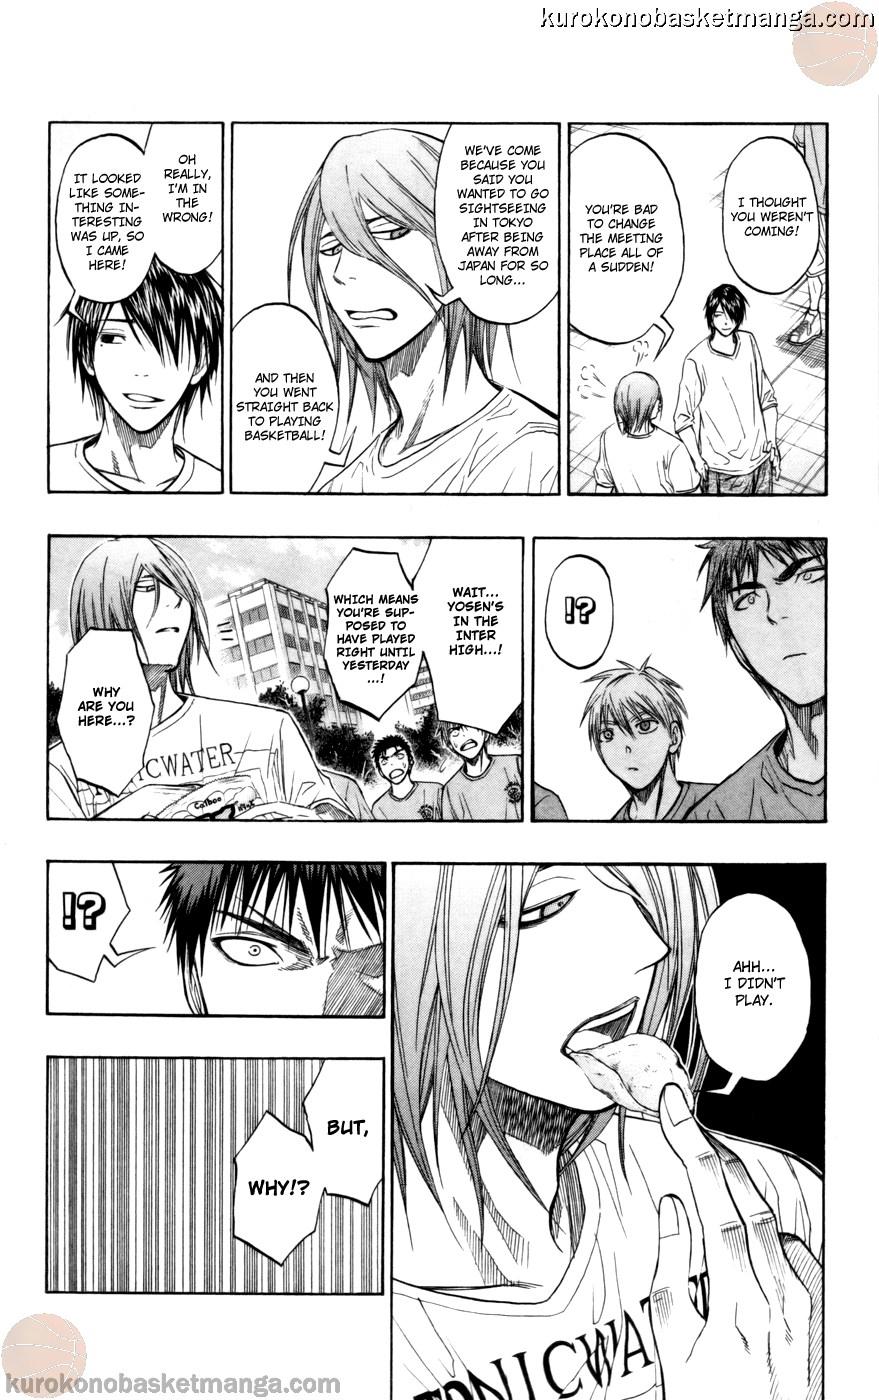 Kuroko no Basket Manga Chapter 78 - Image 04